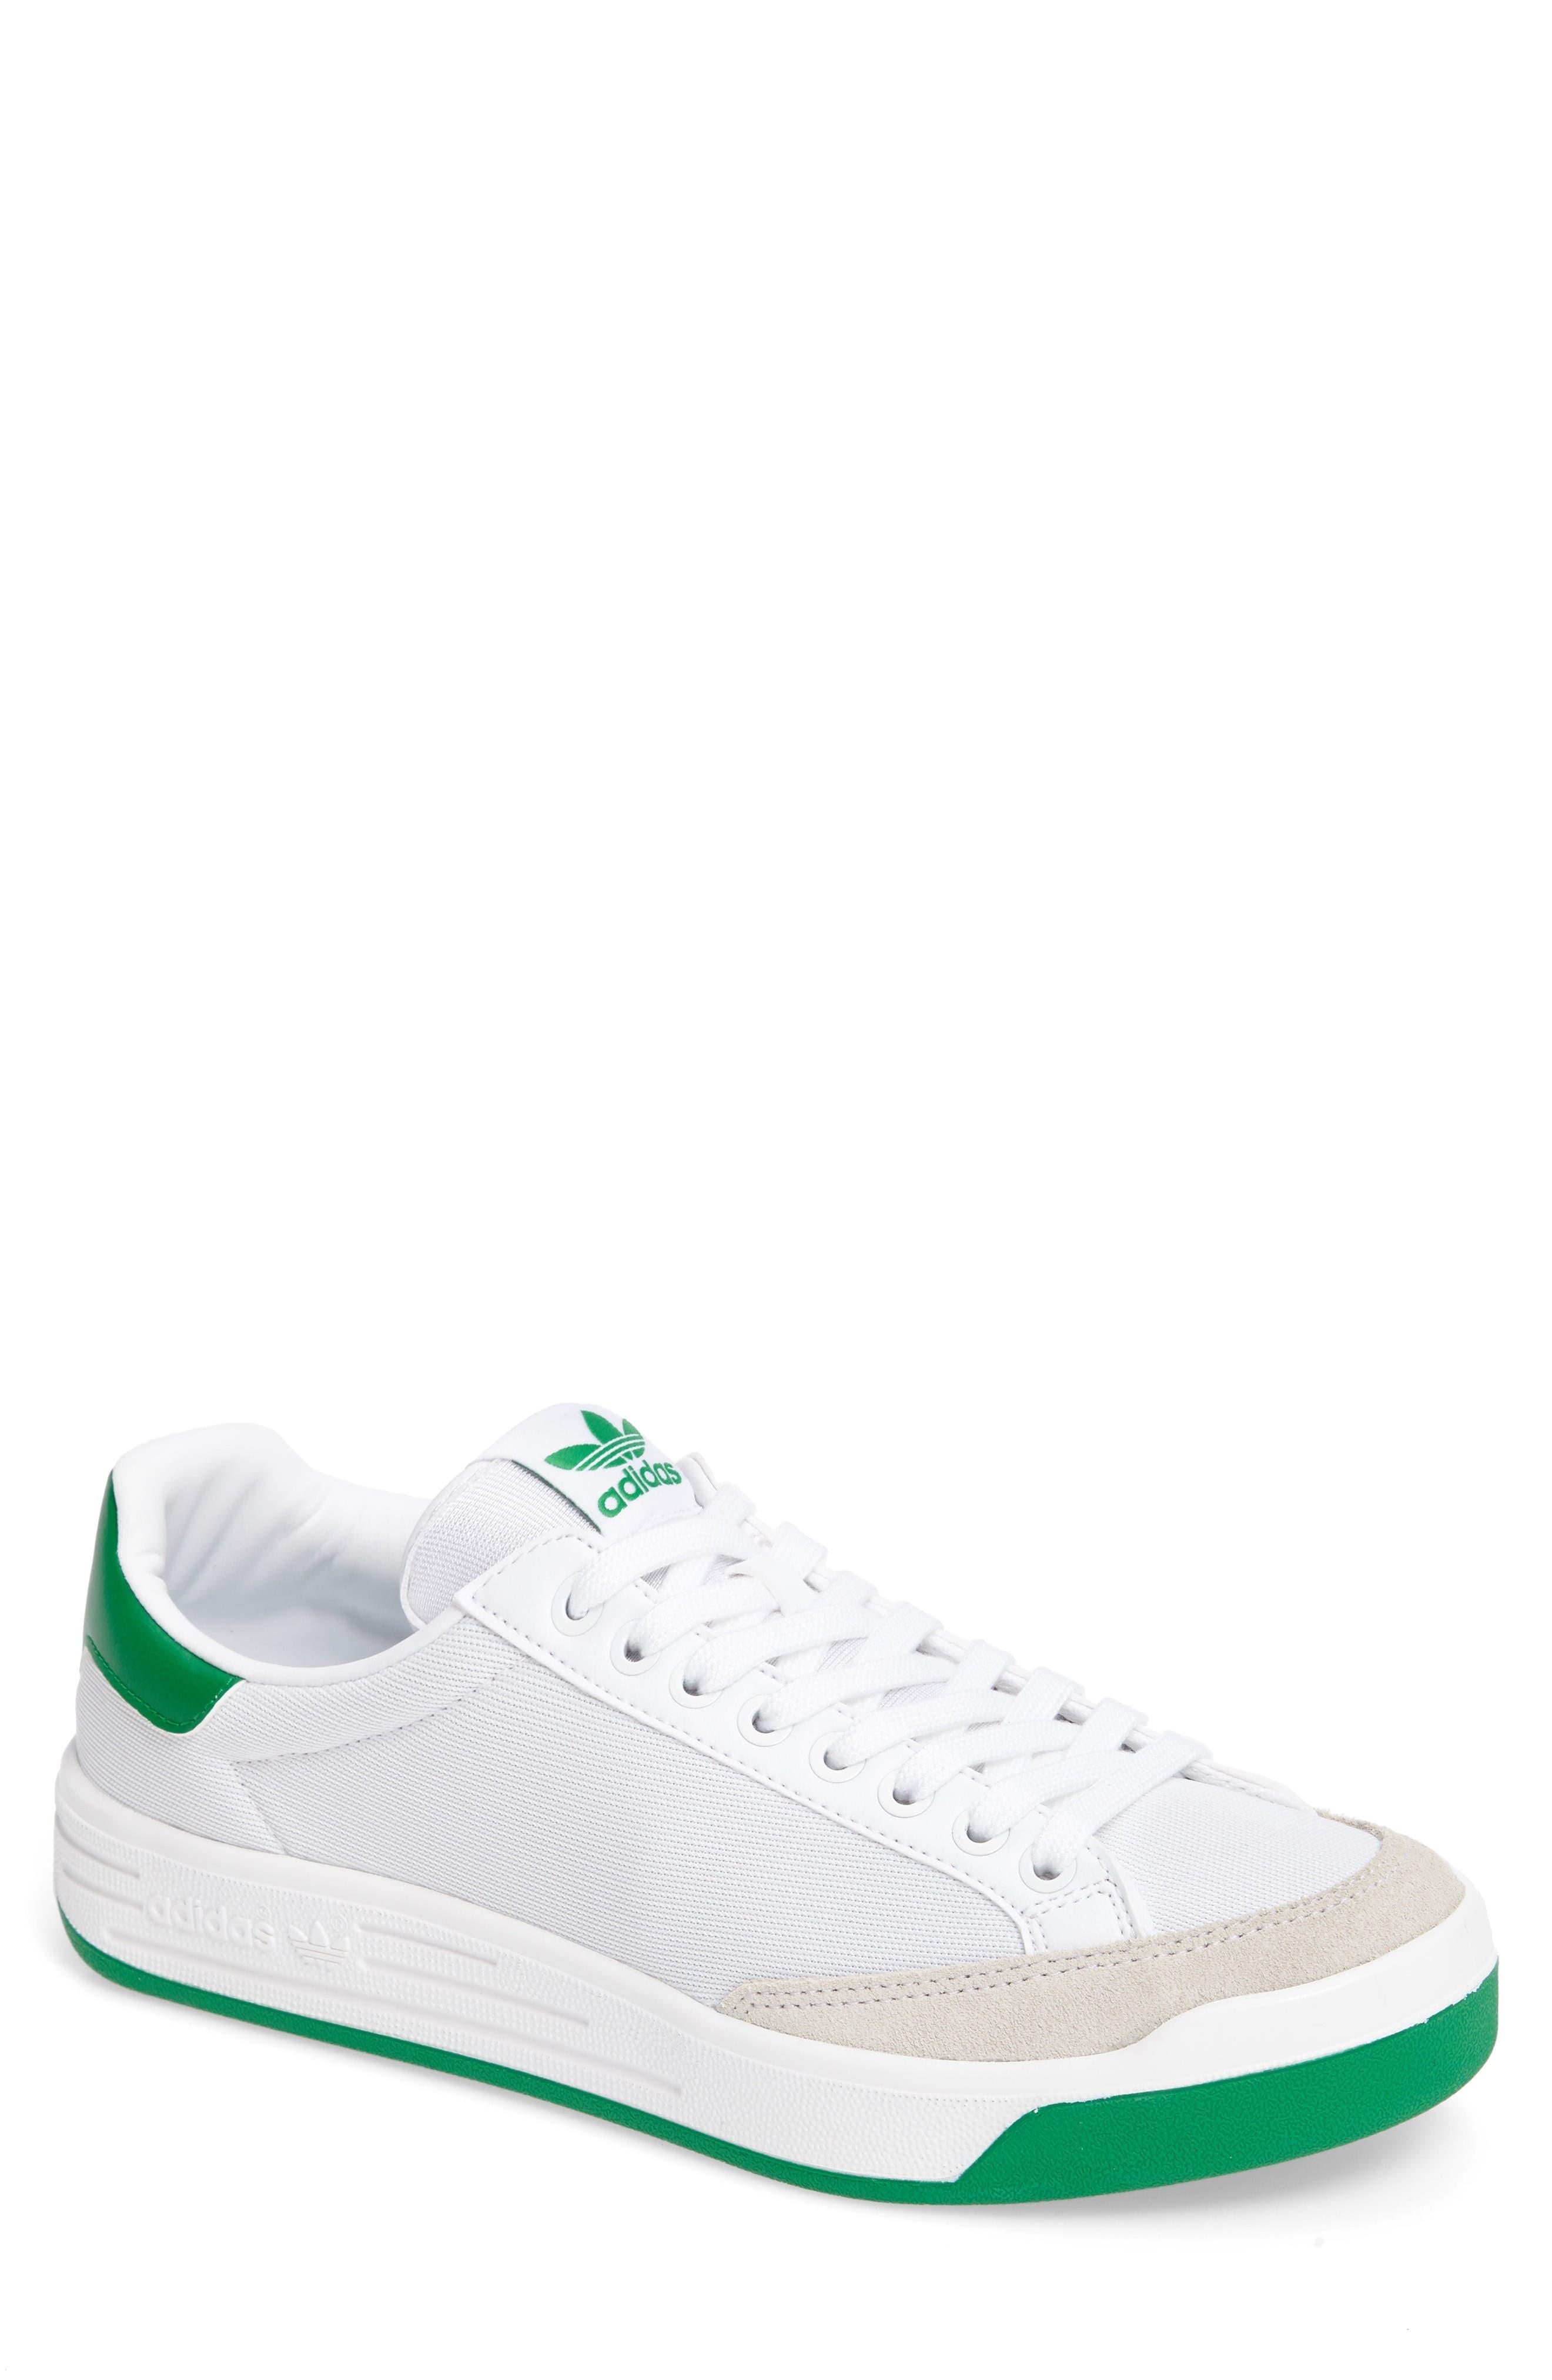 ADIDAS Rod Laver Super Sneaker